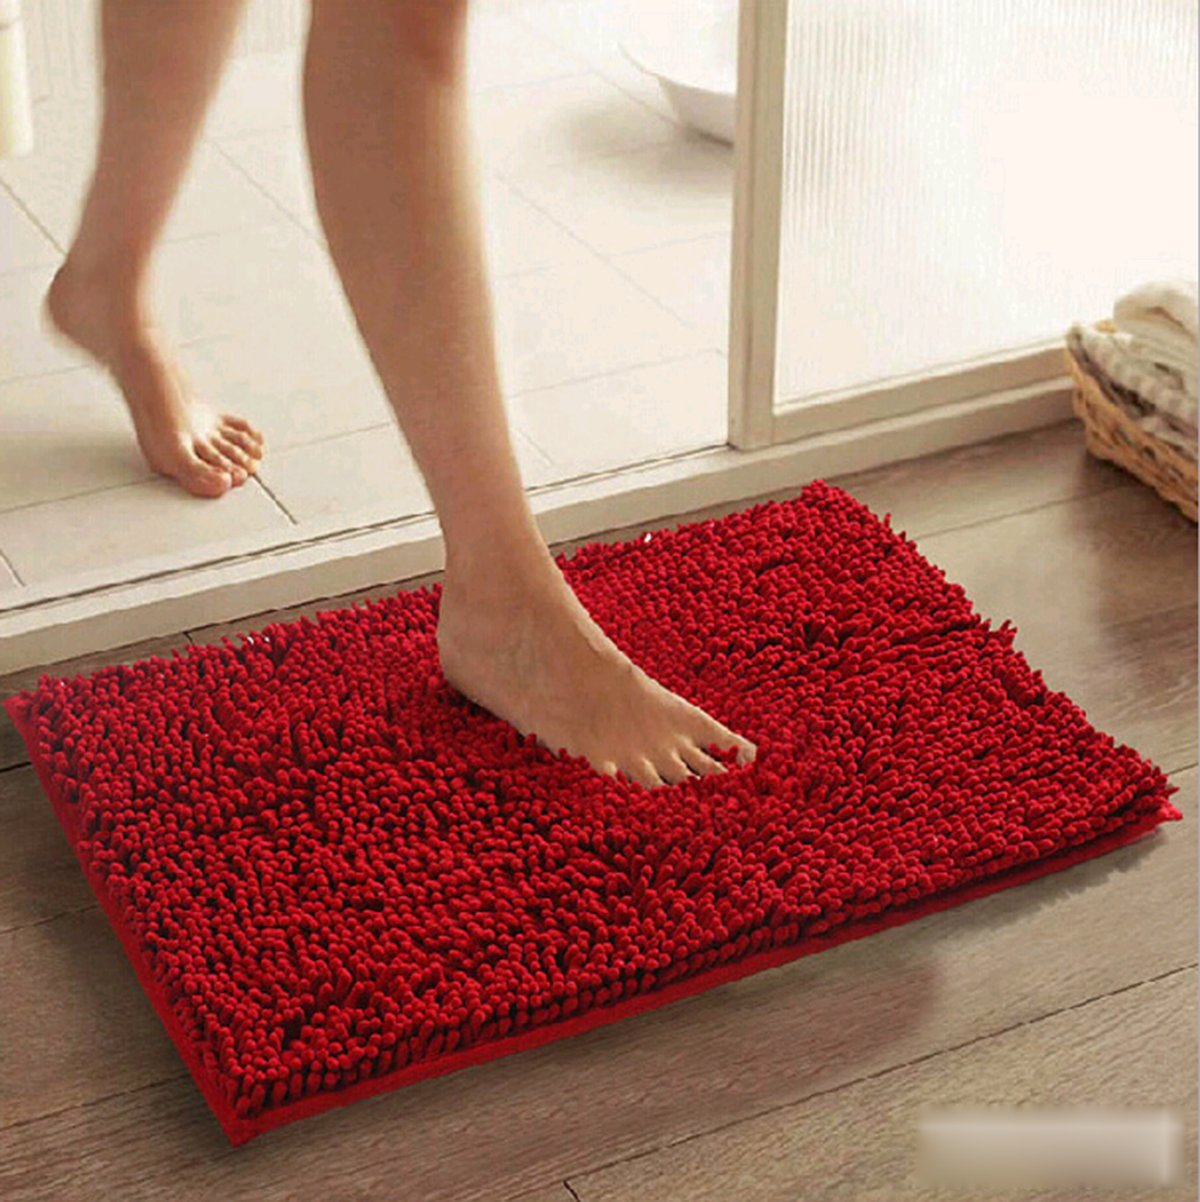 Rainbow Love Square Microfiber Chenille Soft Fluffy Rug Bathroom Bedroom Carpet Non-slip Mat (Red)